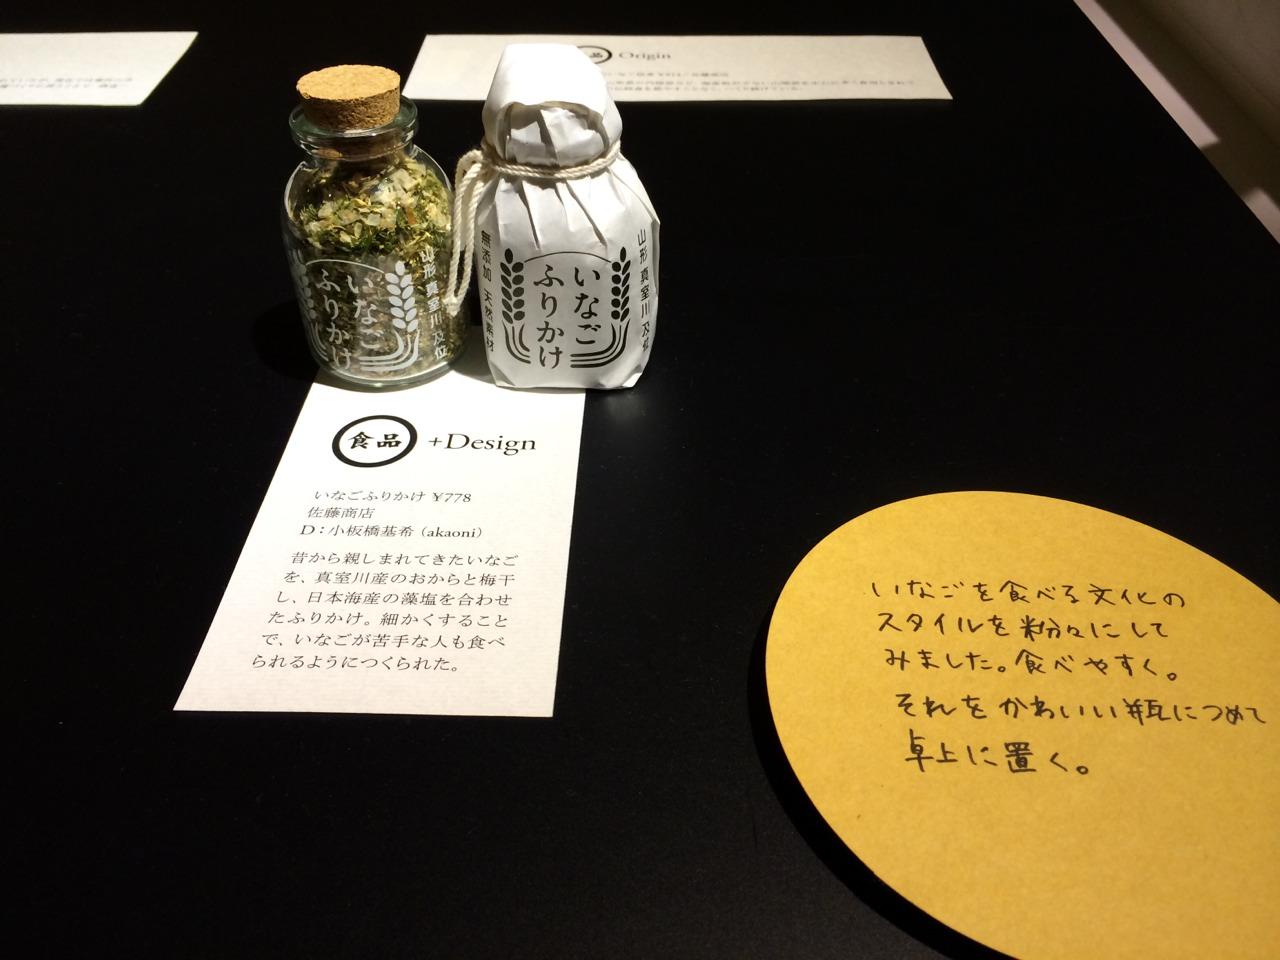 http://www.satoshoten.jp/blog/1411031559405.jpg